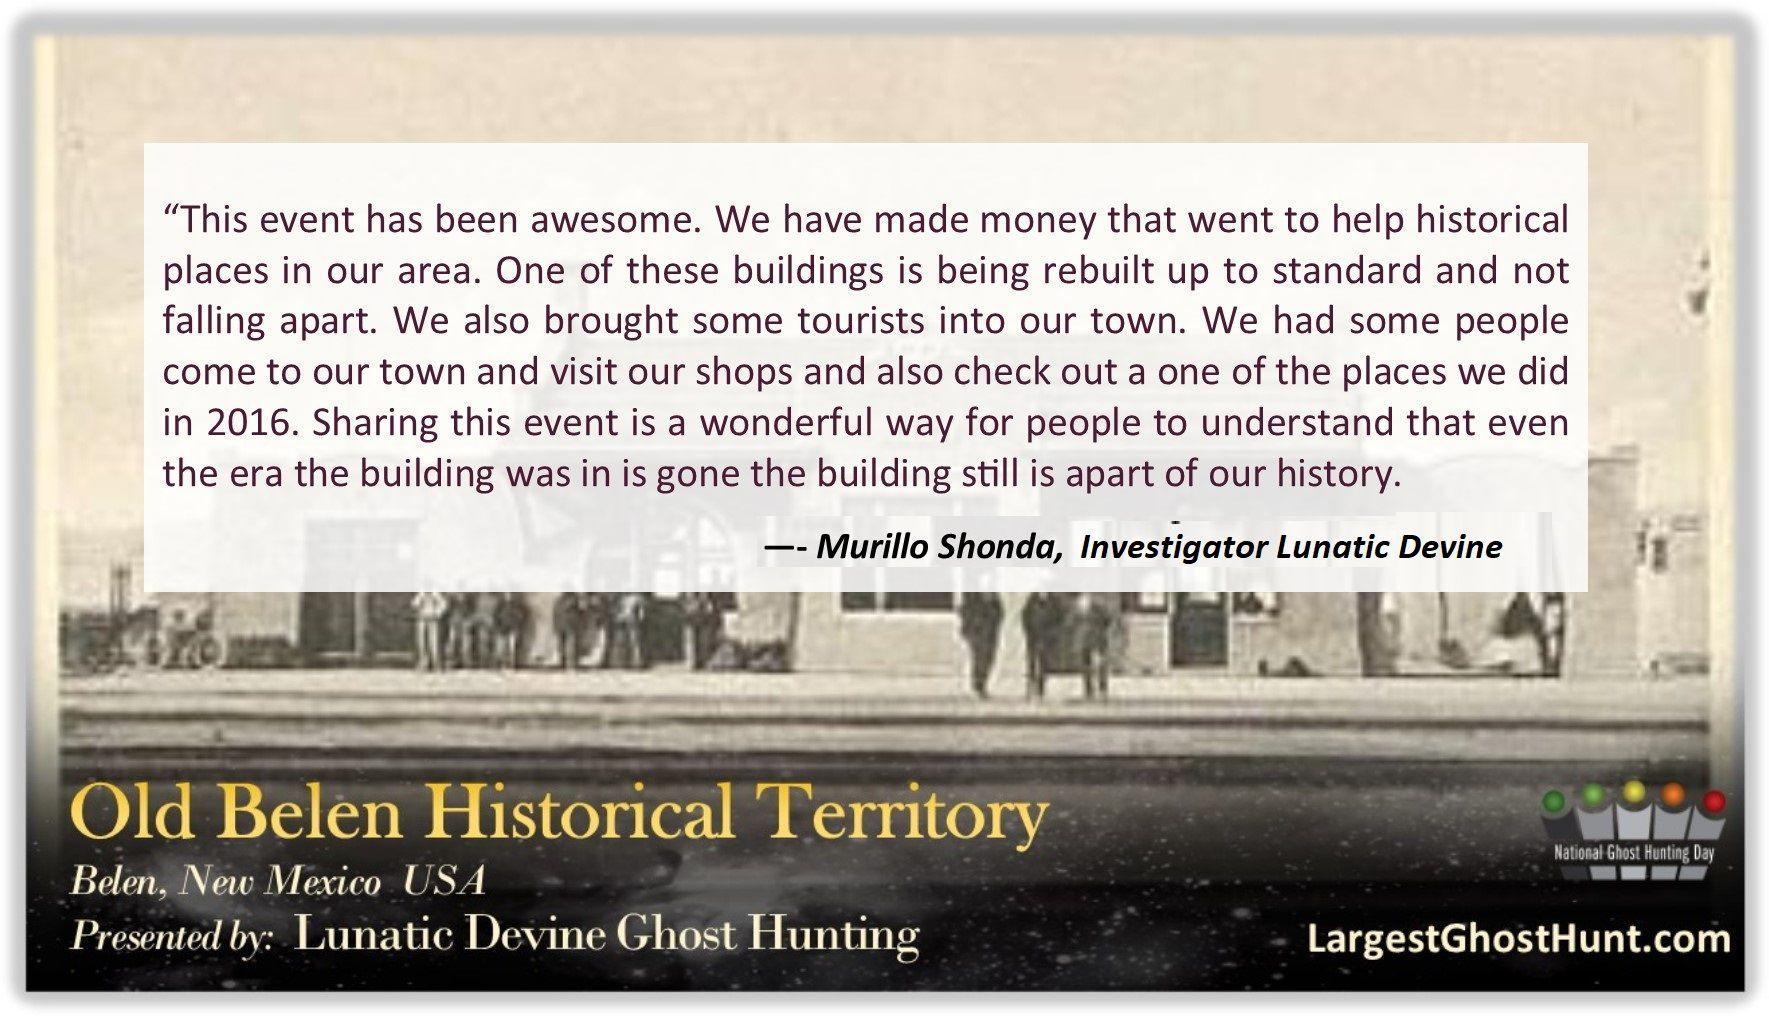 Old Belen Historical Territory